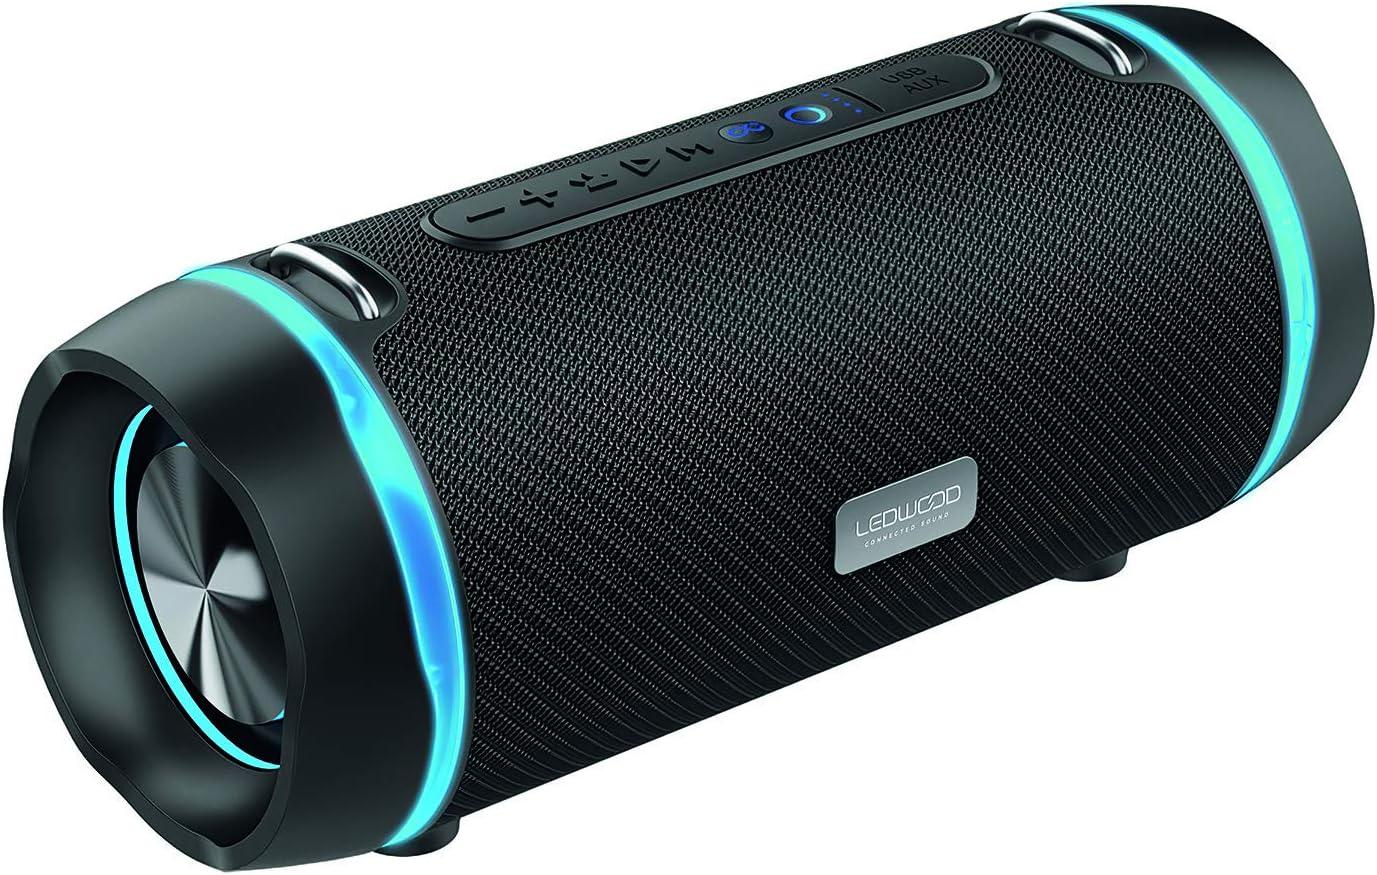 LEDWOOD XT240 TWS - Altavoz Bluetooth portátil con correa, altavoz inalámbrico potente con LED azul - AUX - Puerto USB - Radio FM - Negro